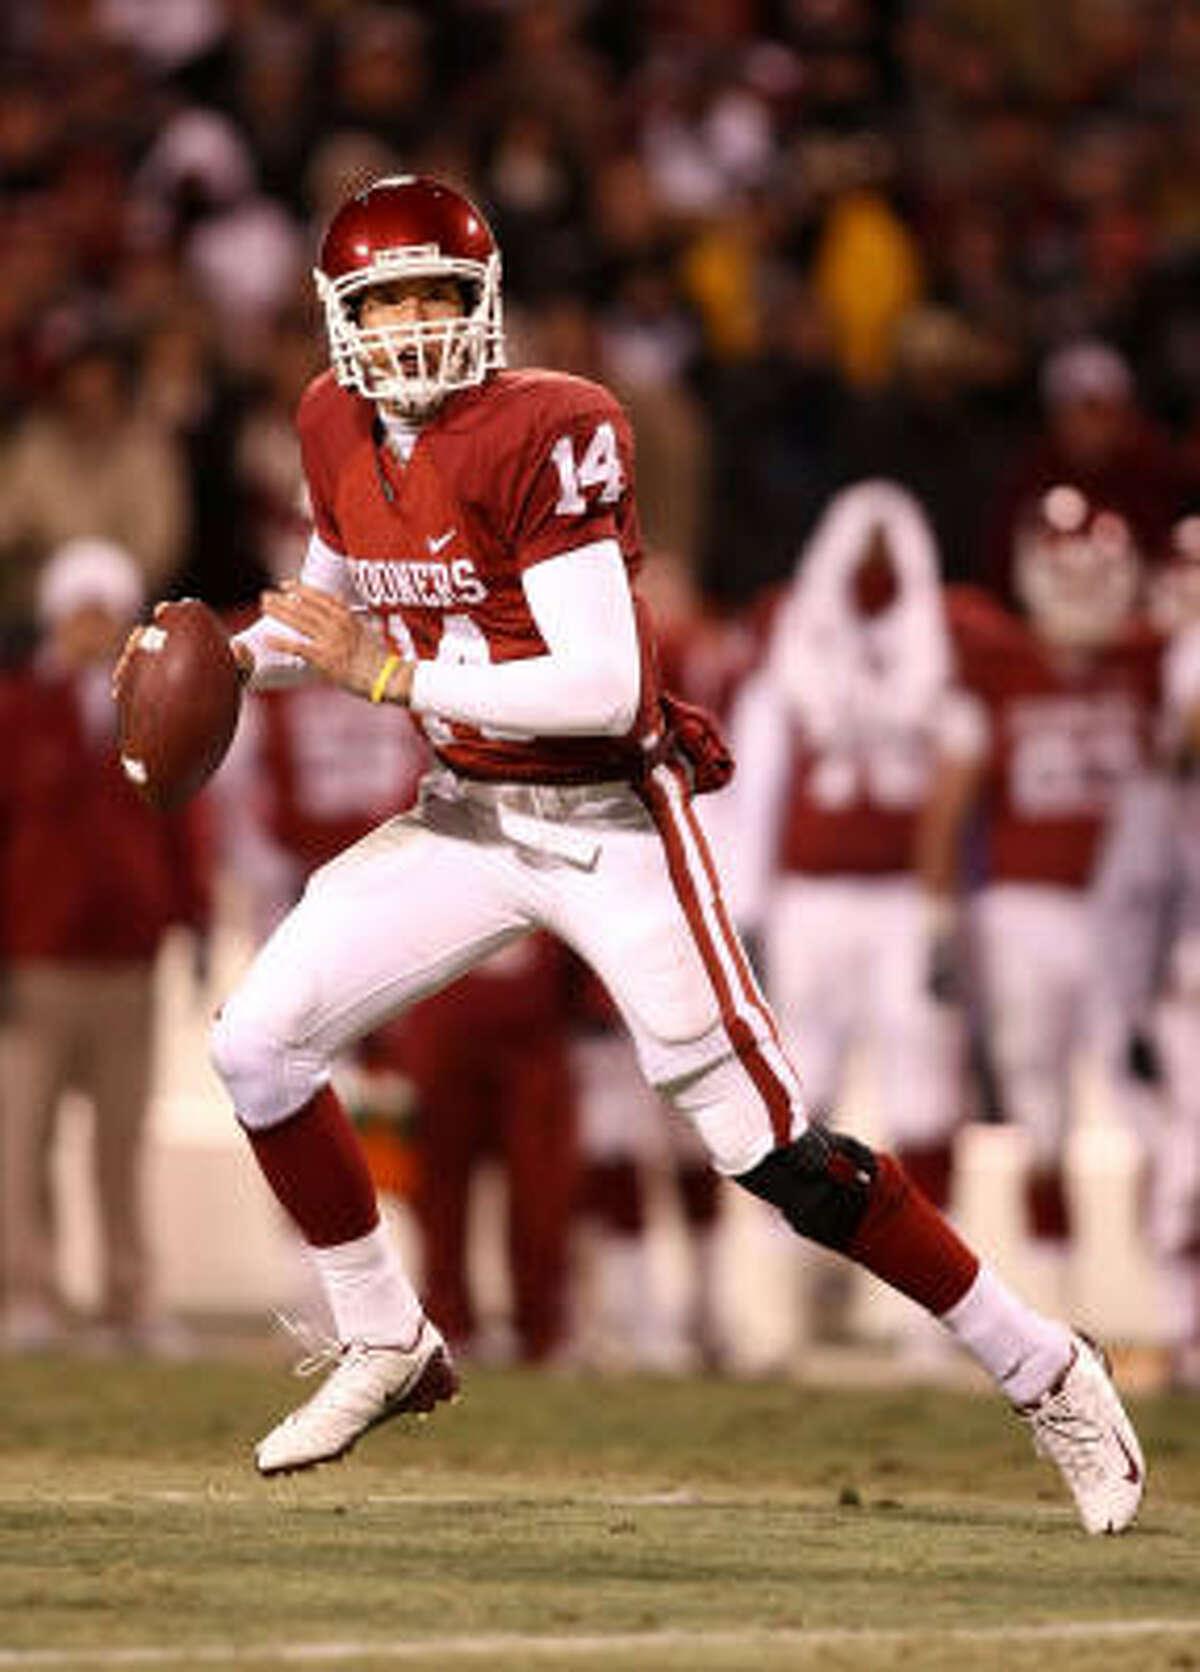 Oklahoma quarterback Sam Bradford has thrown for 48 touchdowns this season. Bradford received 1,726 points to win the Heisman by 122 points.